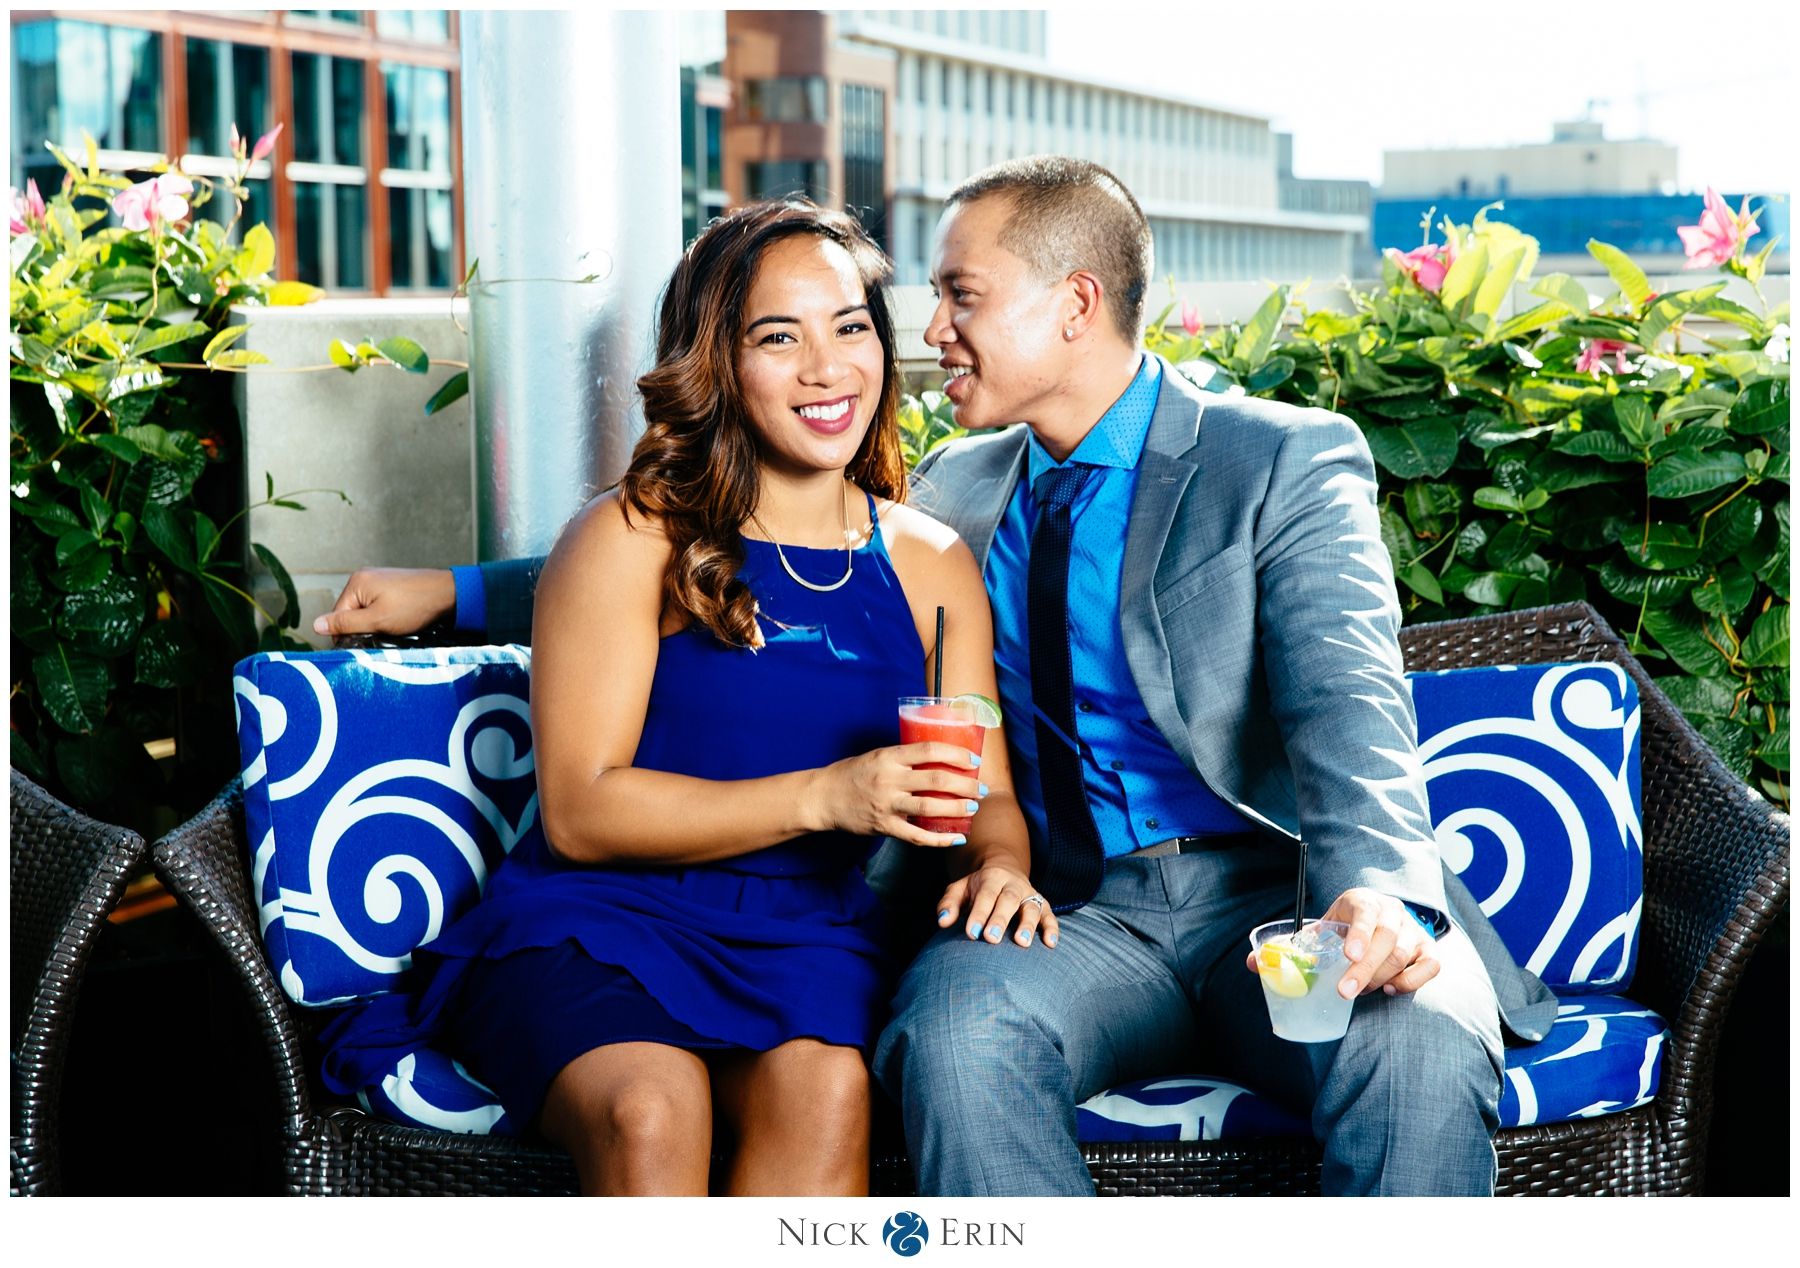 Donner_Photography_Washington DC Engagement Session_Jenny Mae & Vic_0008